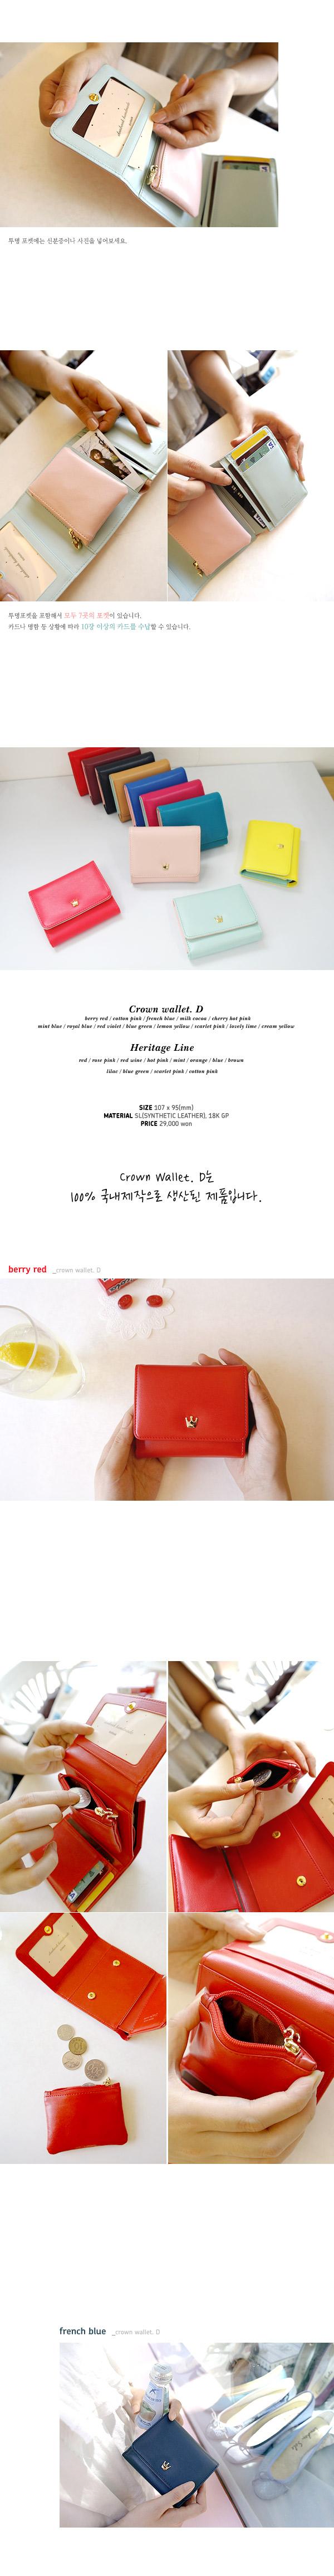 Crown Wallet  D - 돈북, 29,000원, 여성지갑, 반지갑